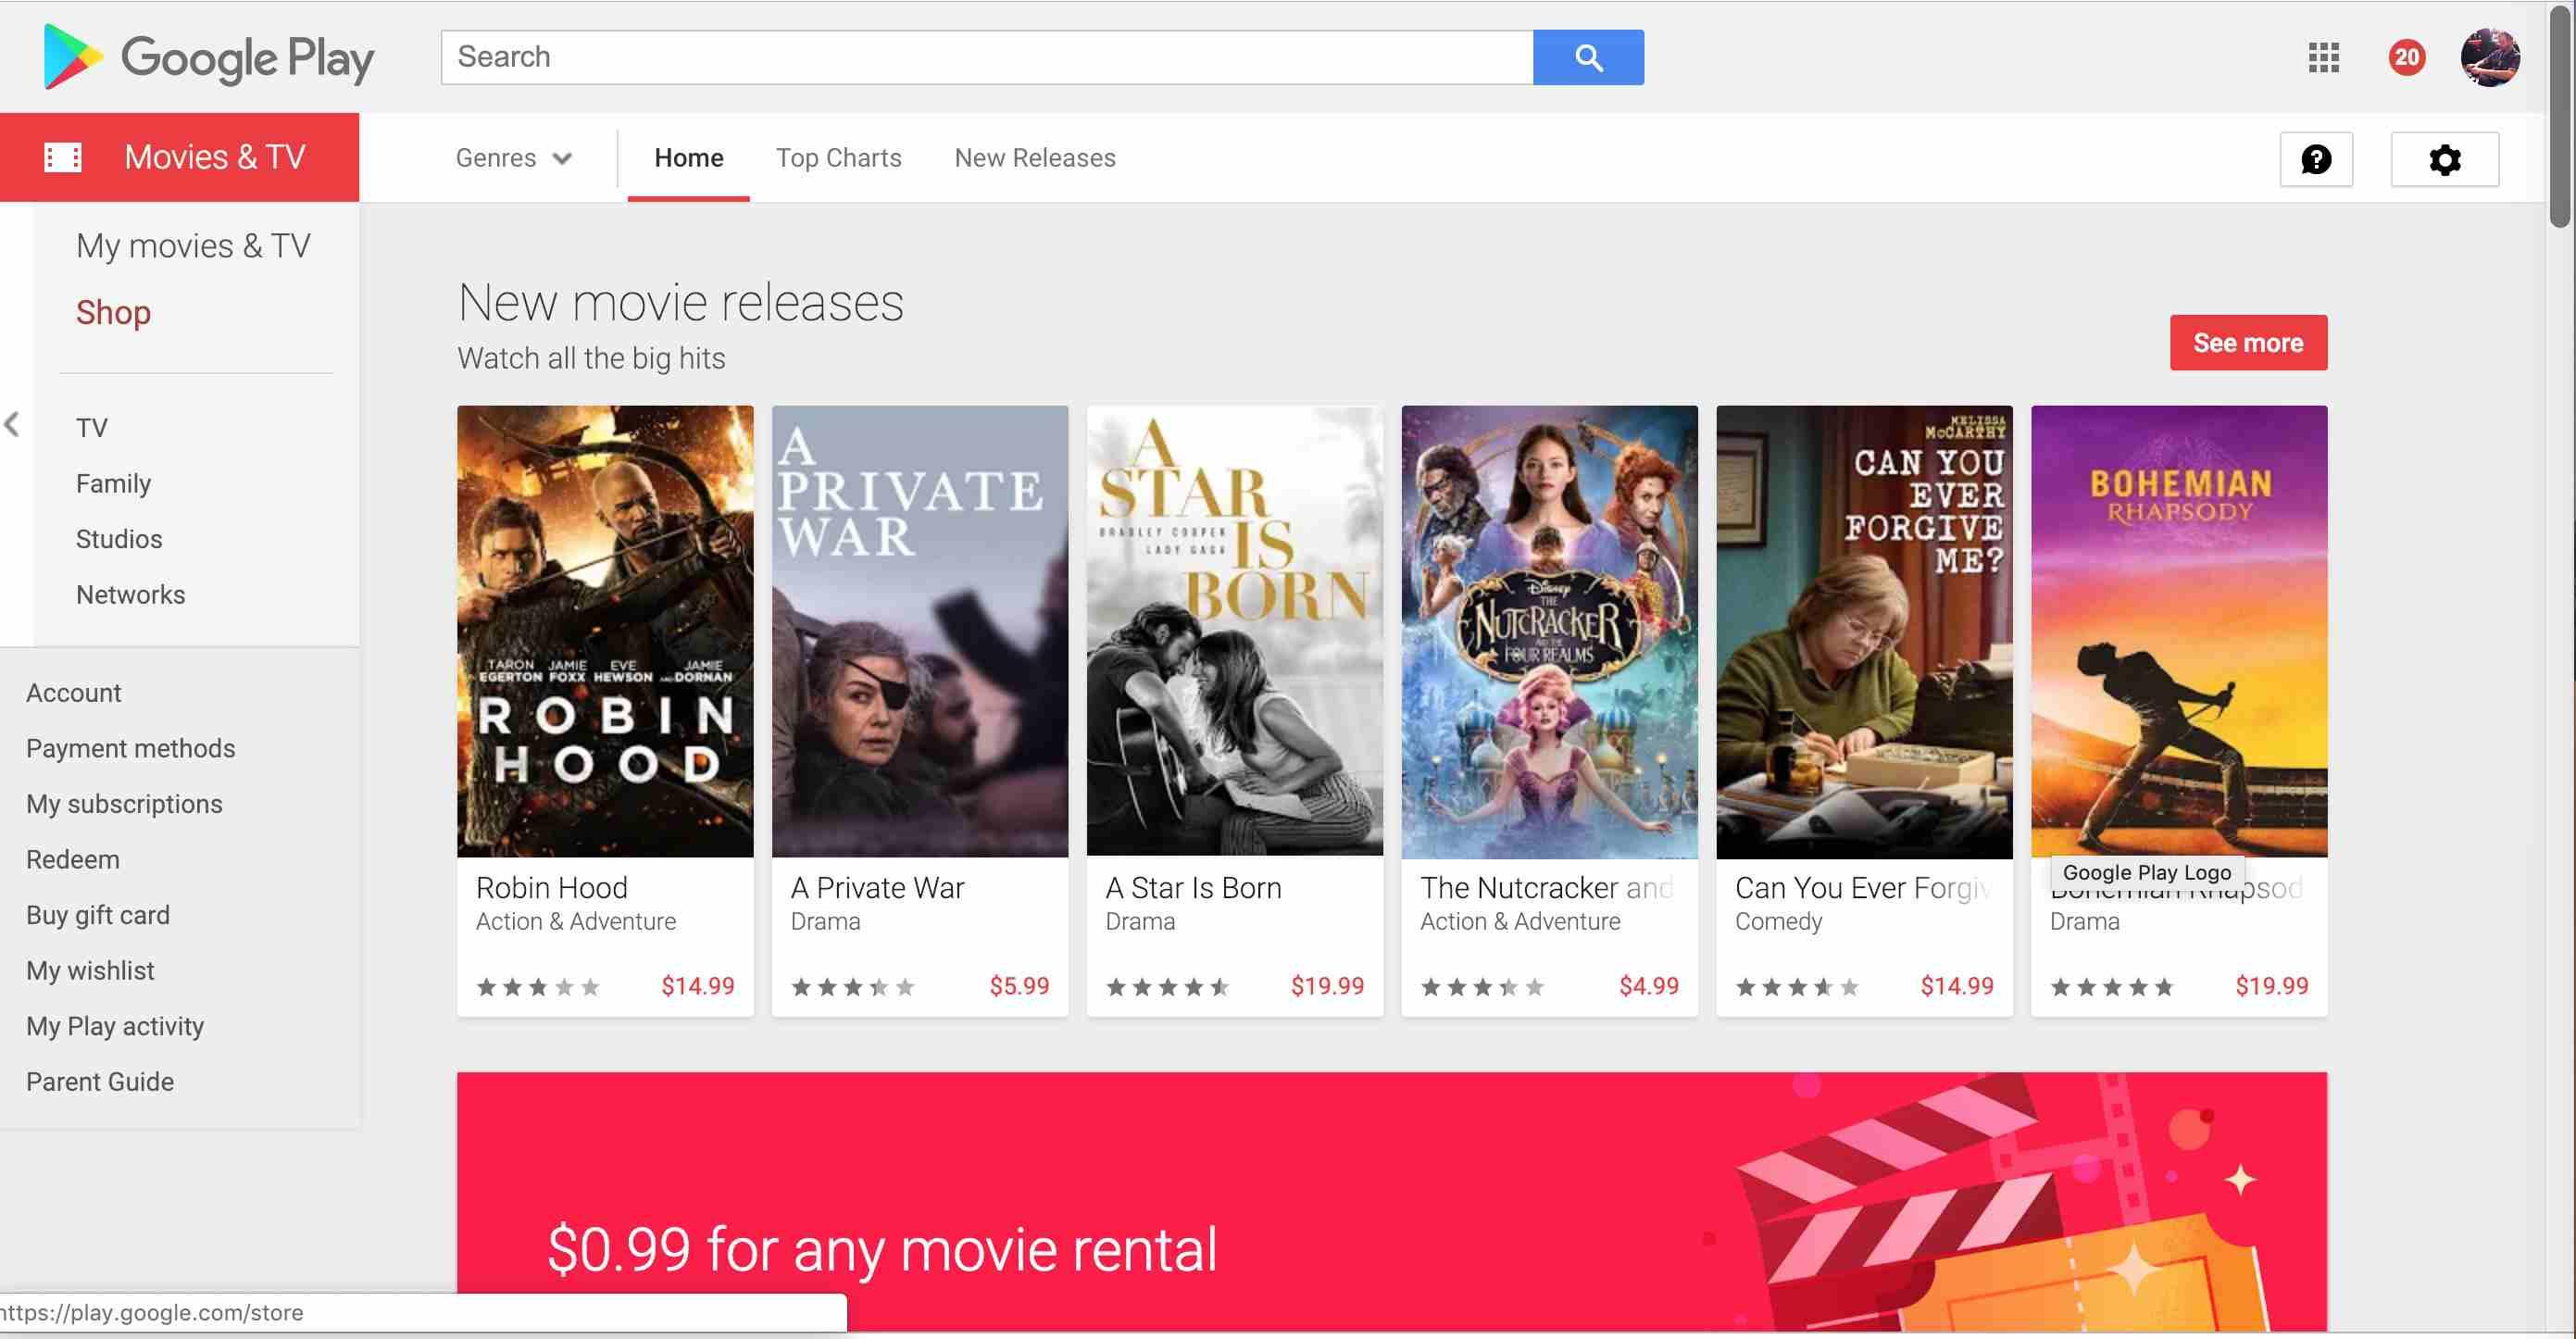 Google Play Movies & TV website